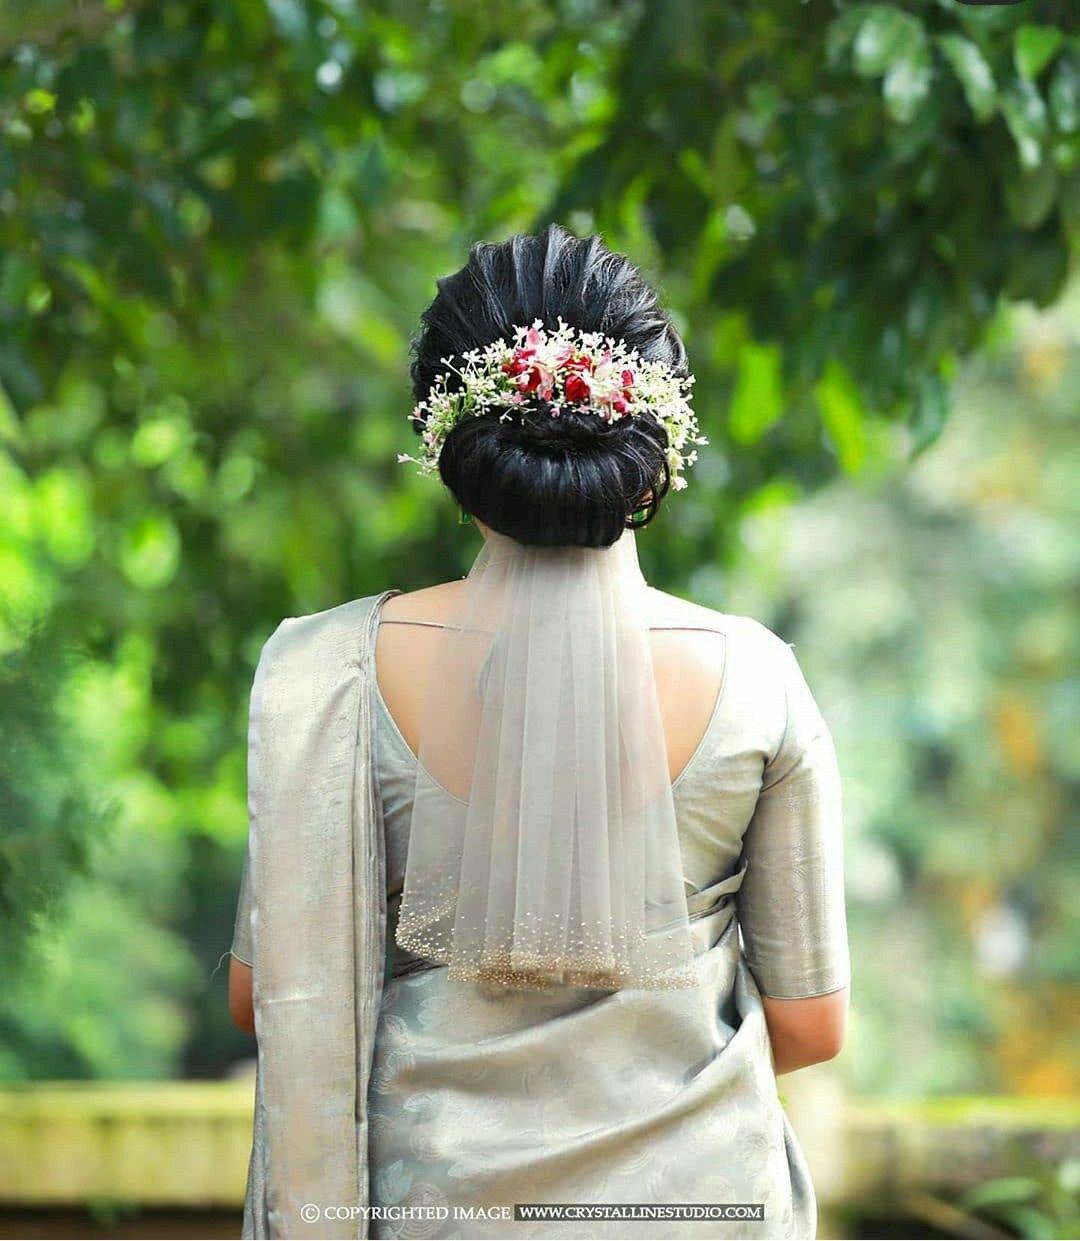 Pin By Rose Joy On Christian Bridal Wear In 2020 Christian Bridal Saree Christian Wedding Gowns Christian Bride